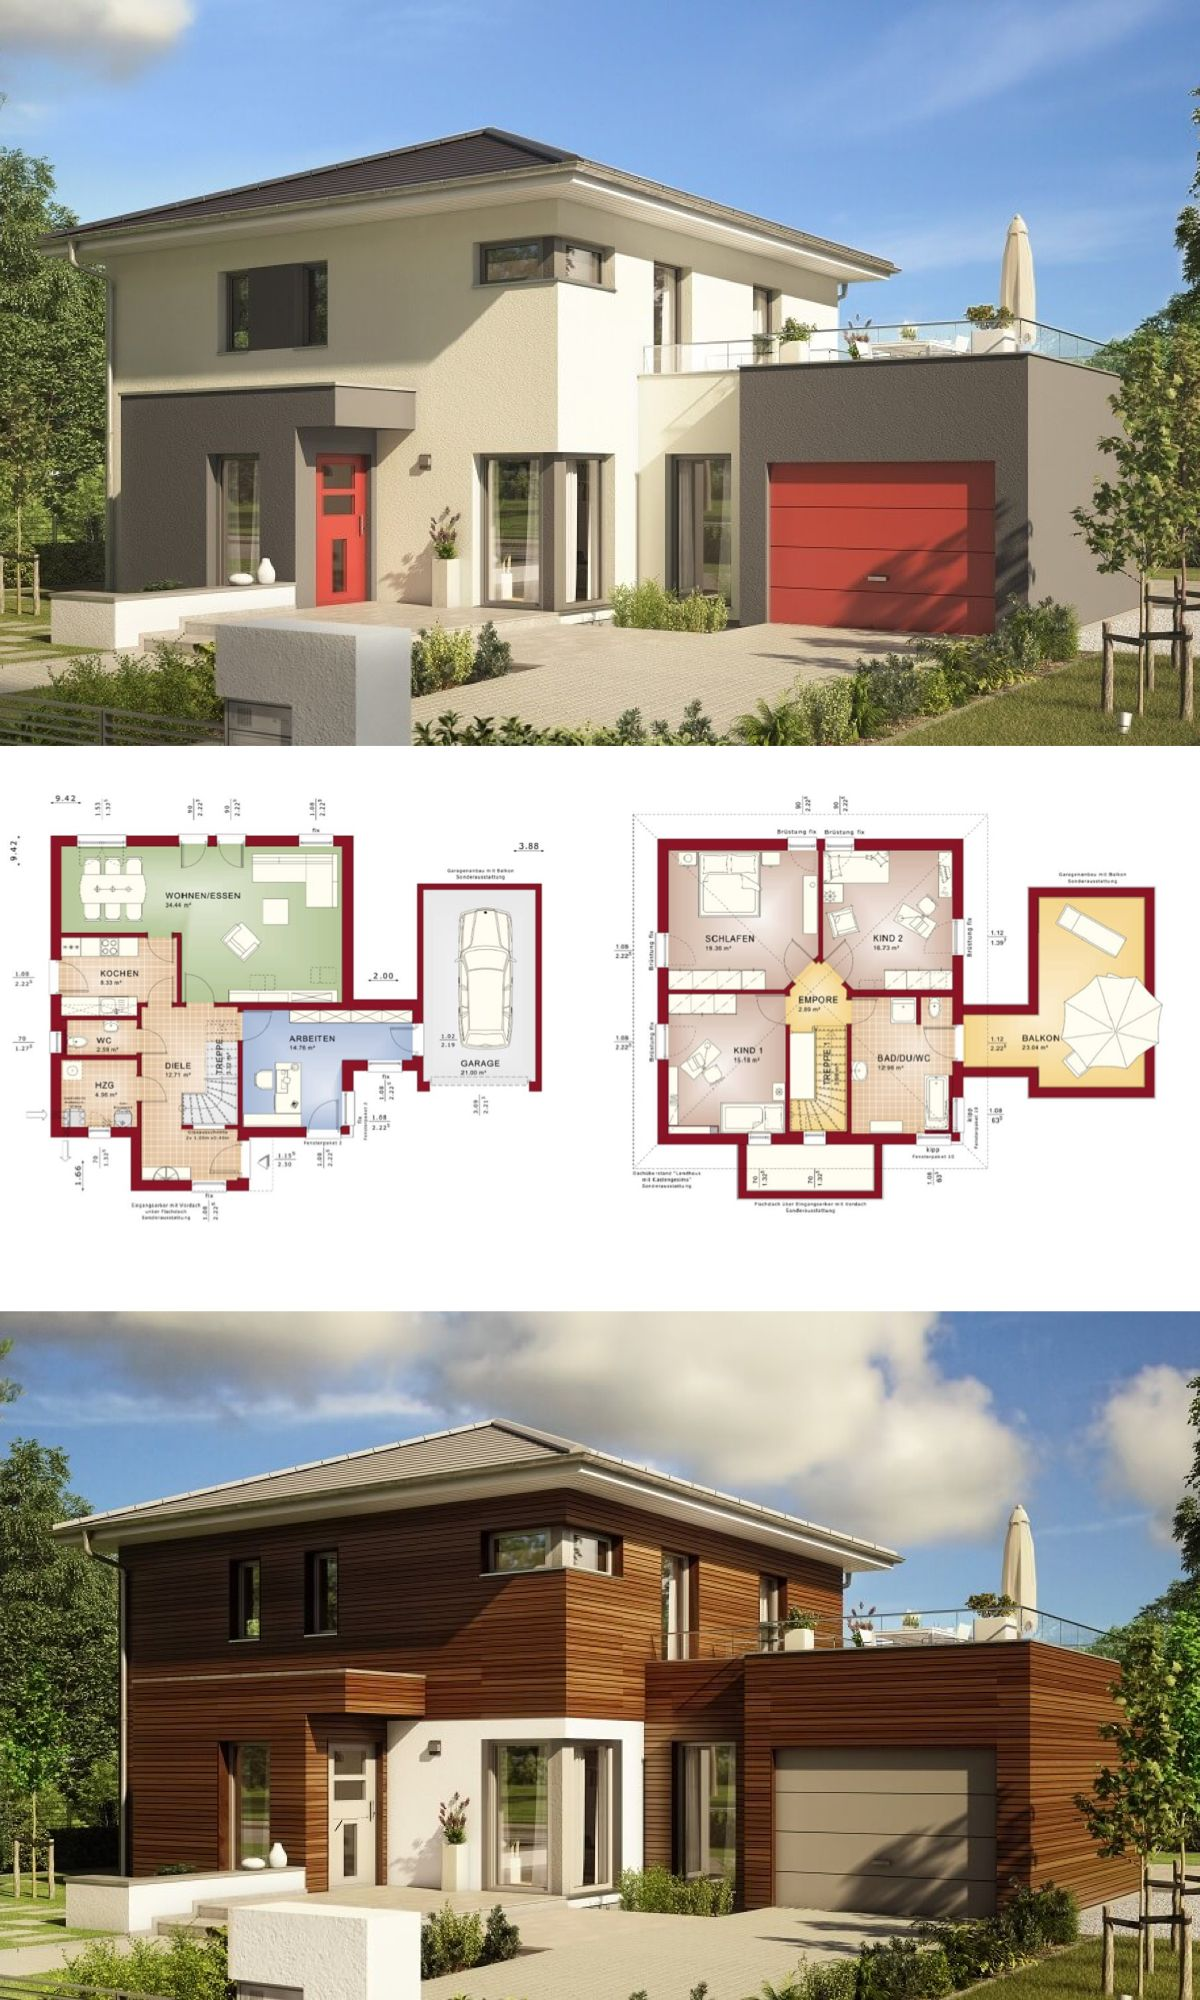 Moderne stadtvilla haus evolution 143 v12 bien zenker for Haus mit garage